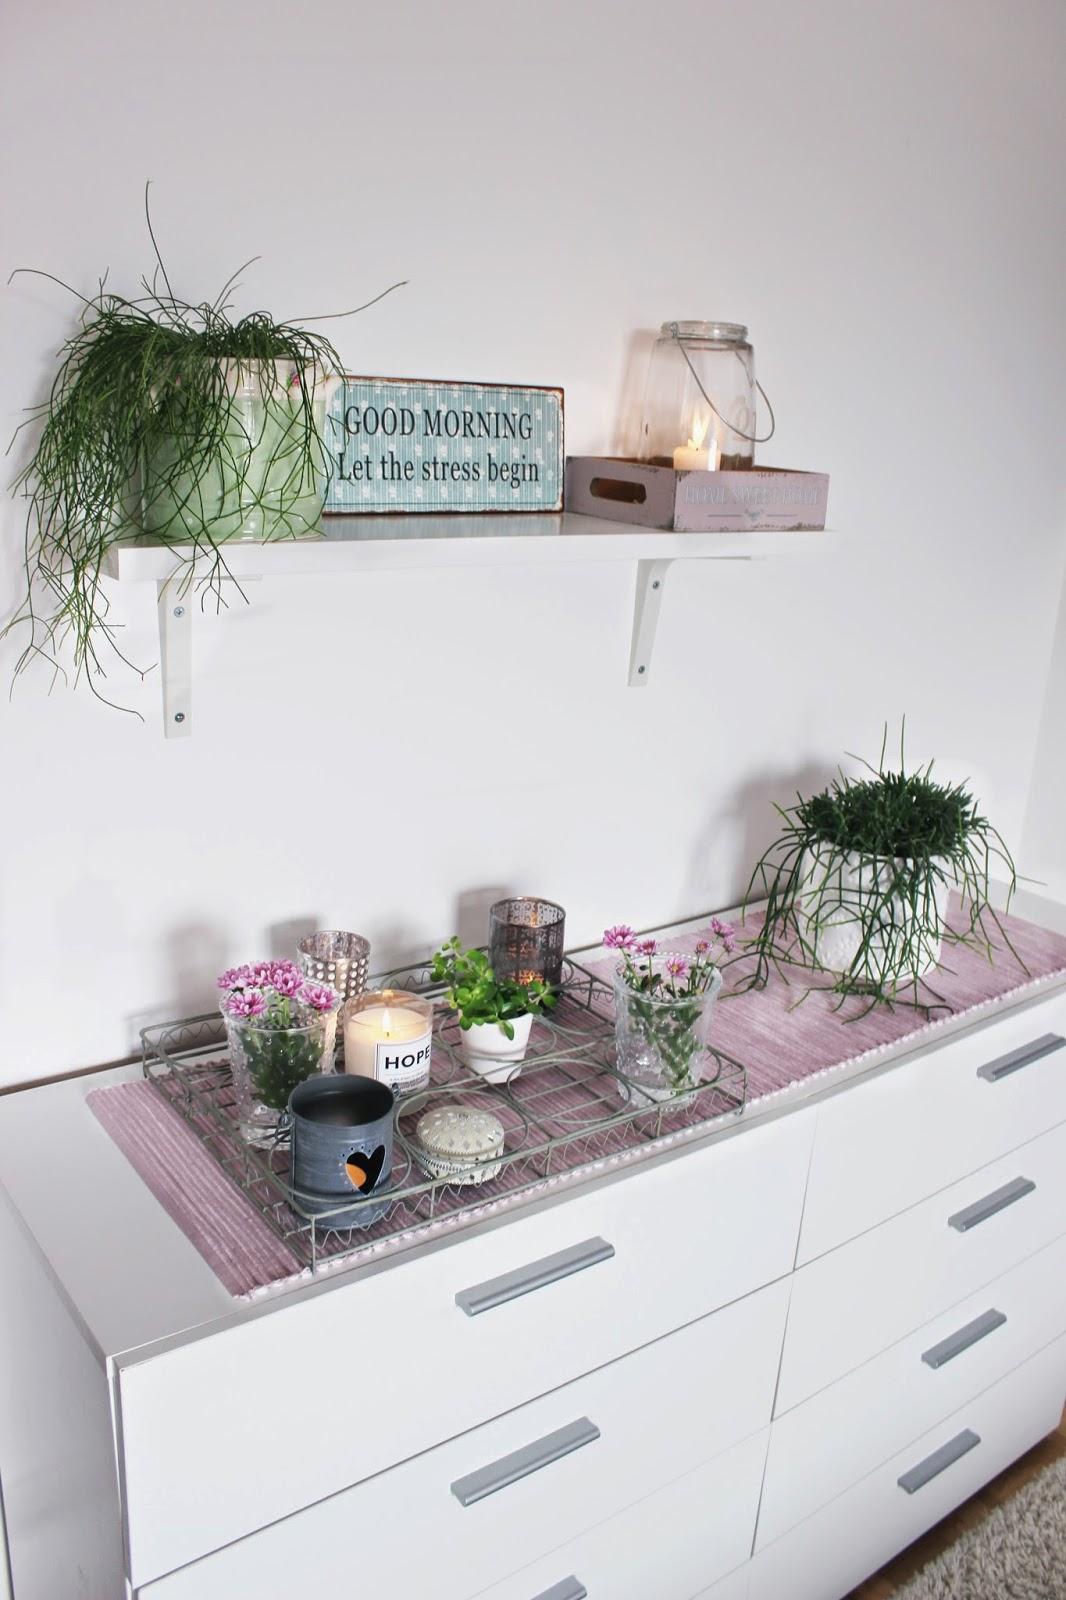 s'Bastelkistle: {DIY} Mini Paletten Bilder